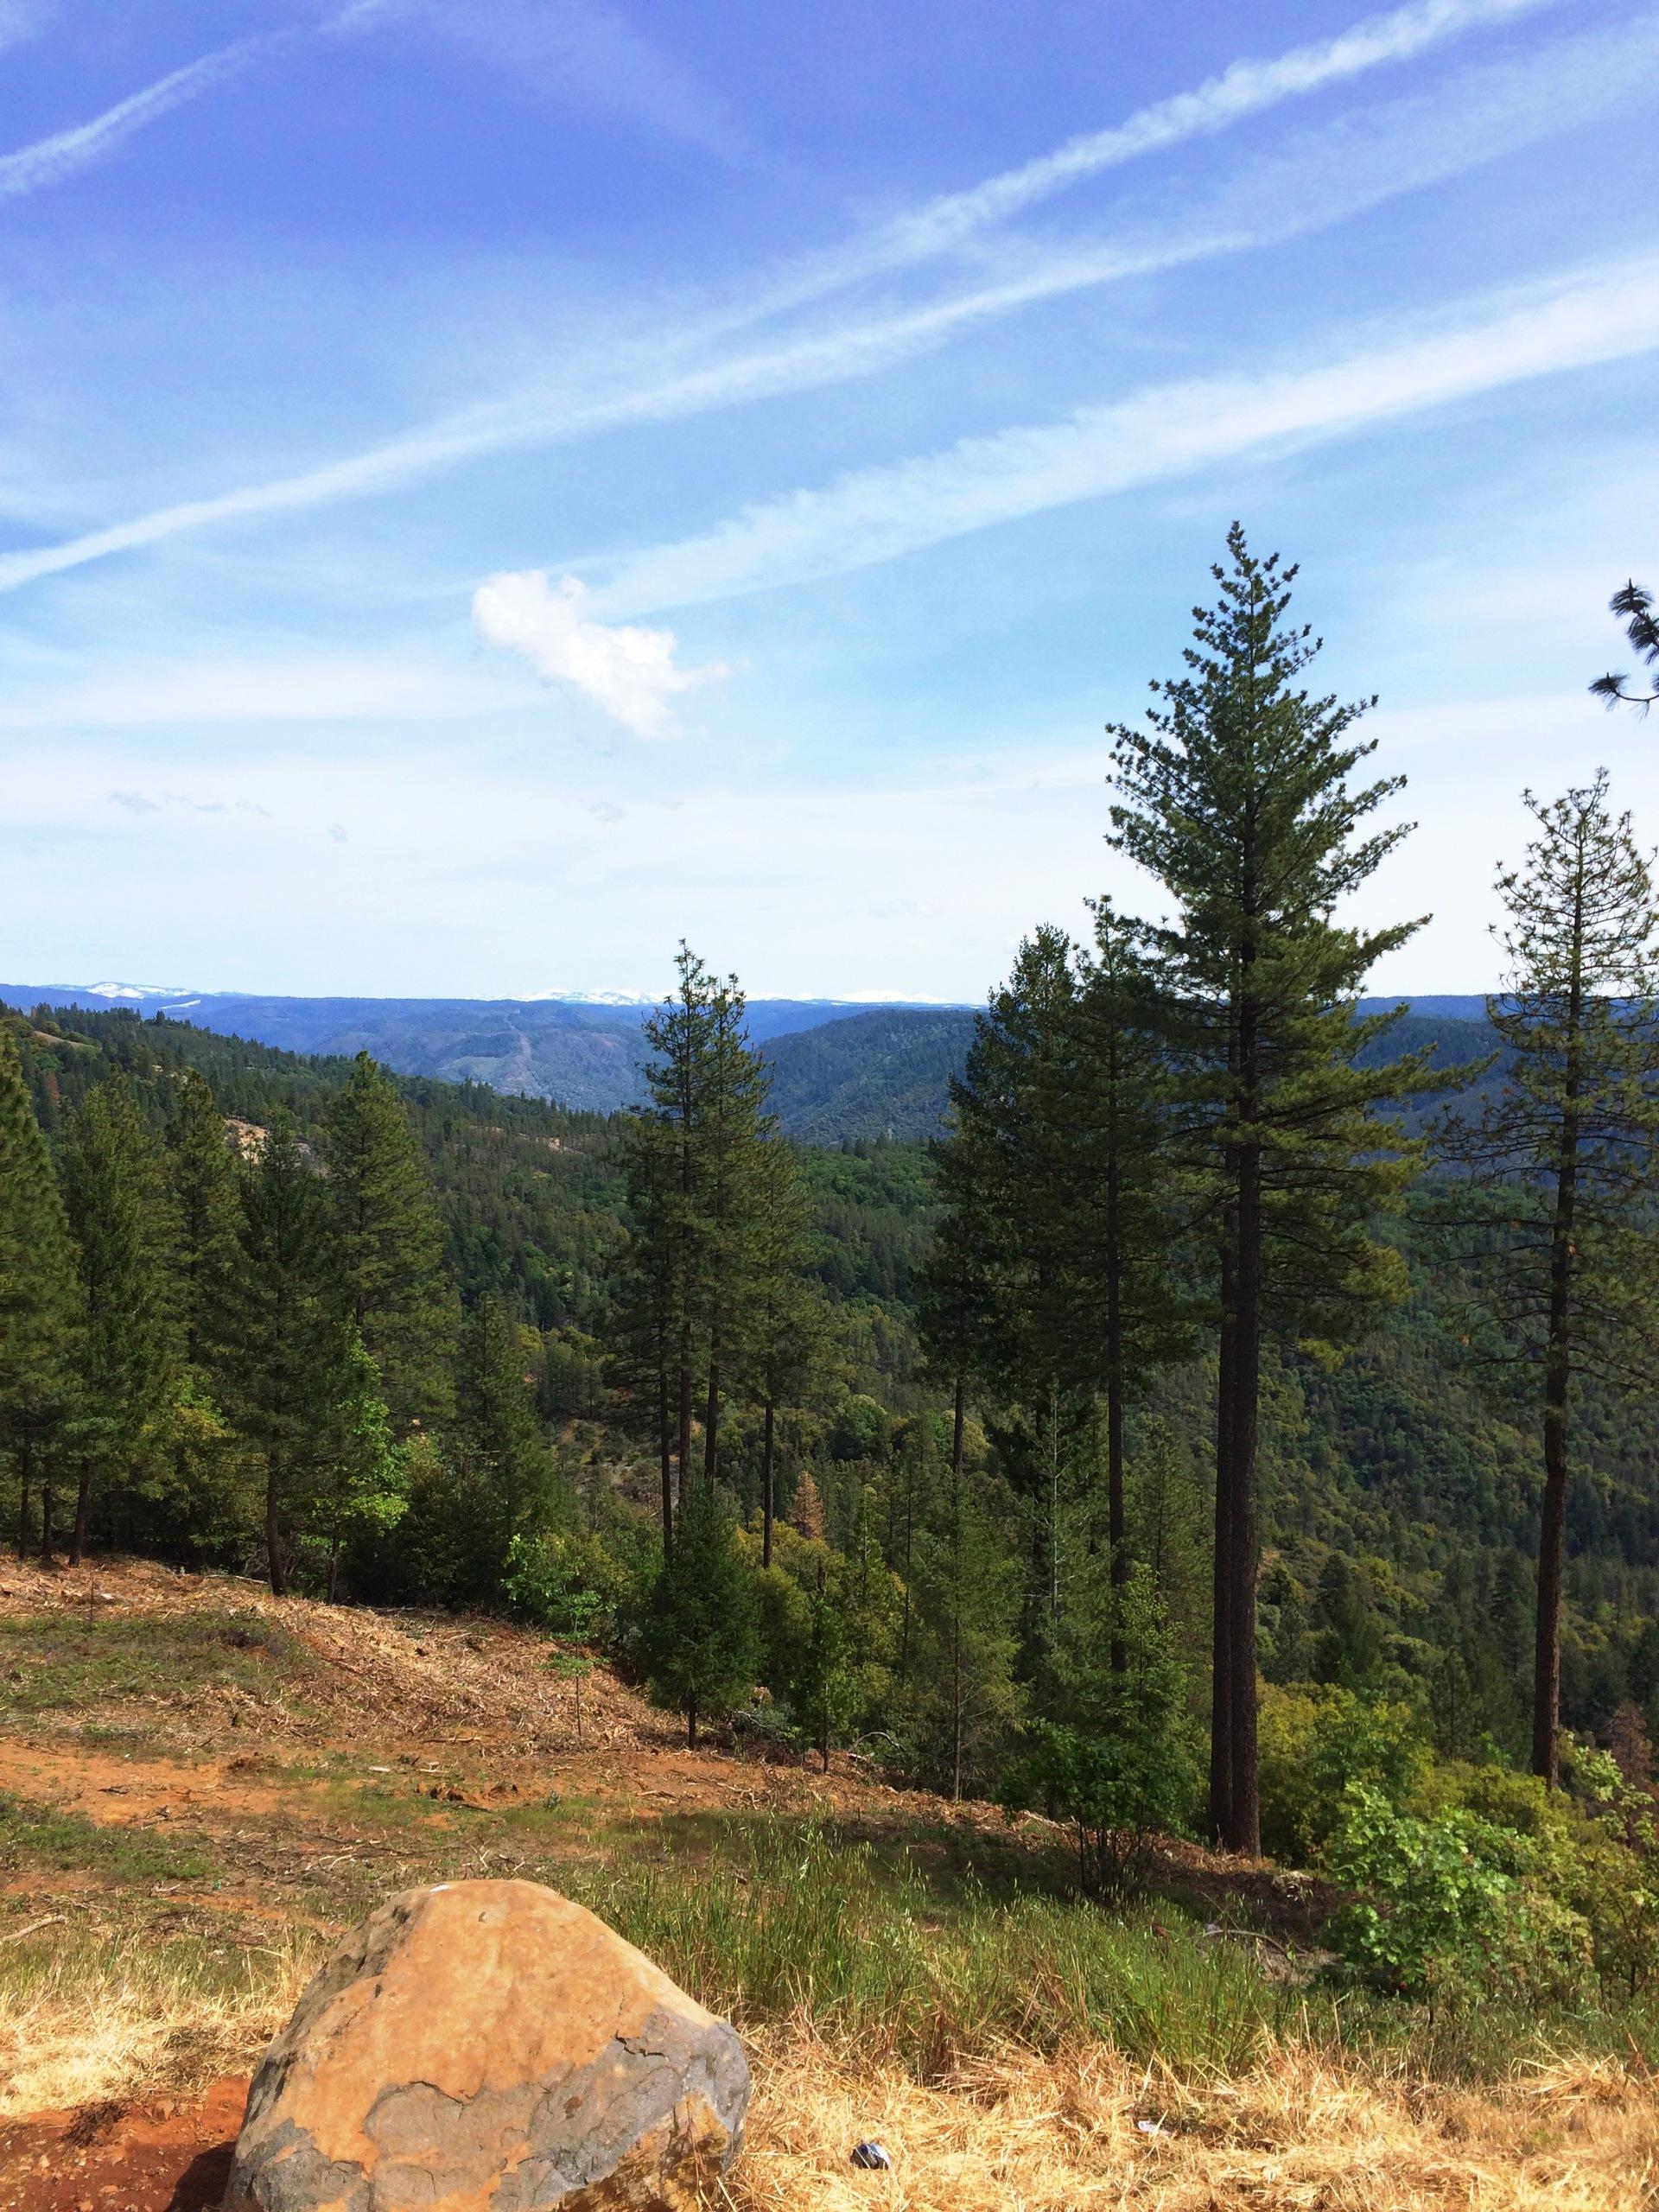 Mountain Range. Mountain Range   fun, mountain climbing, mountain hike, hiker